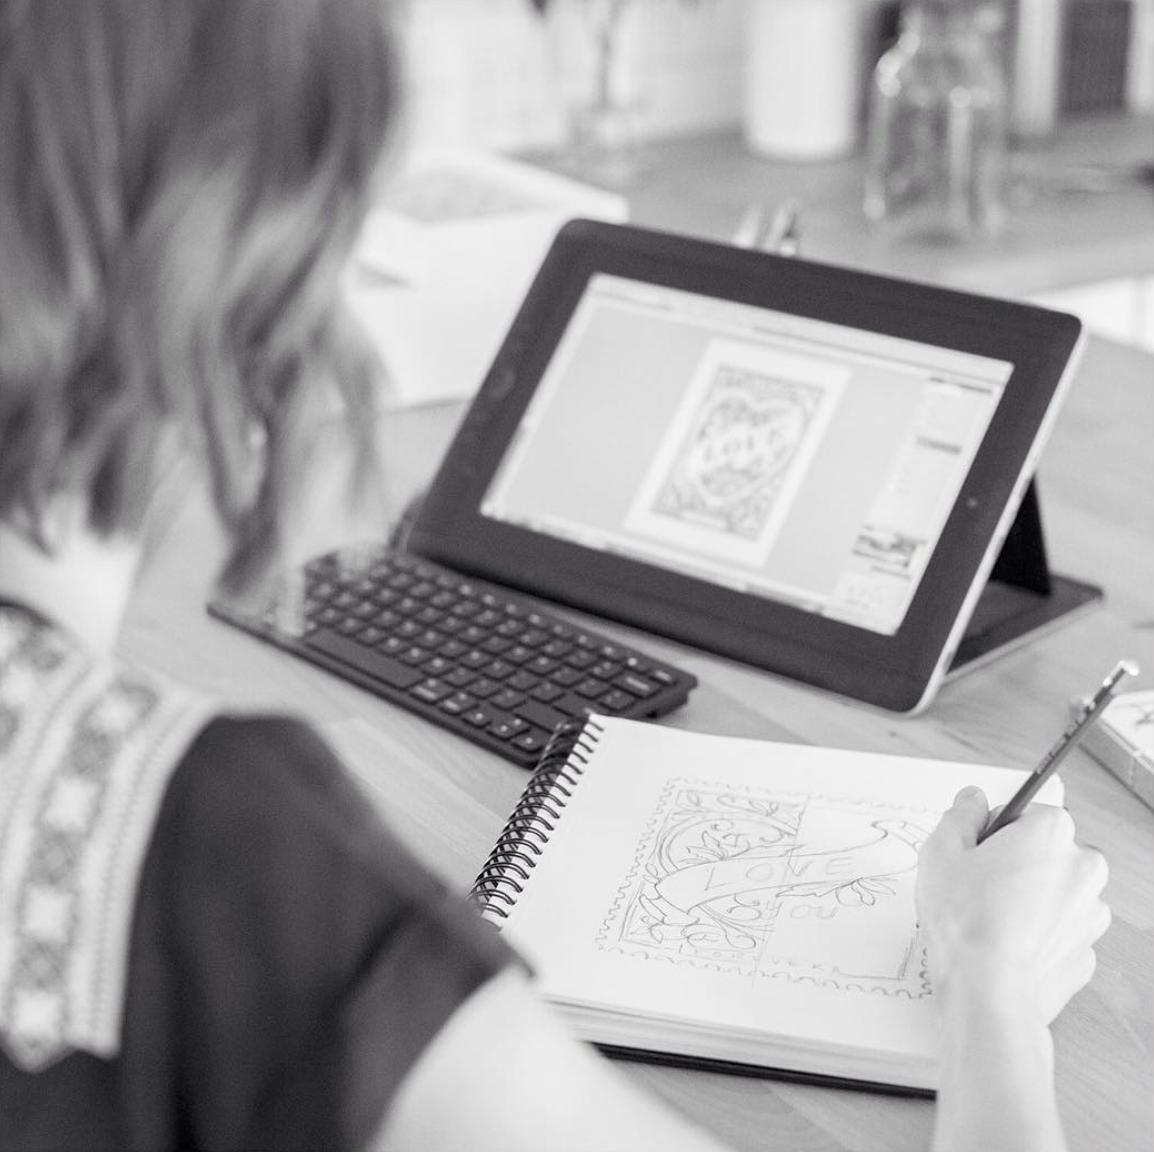 Amy Heitman sketching with Wacom tablet